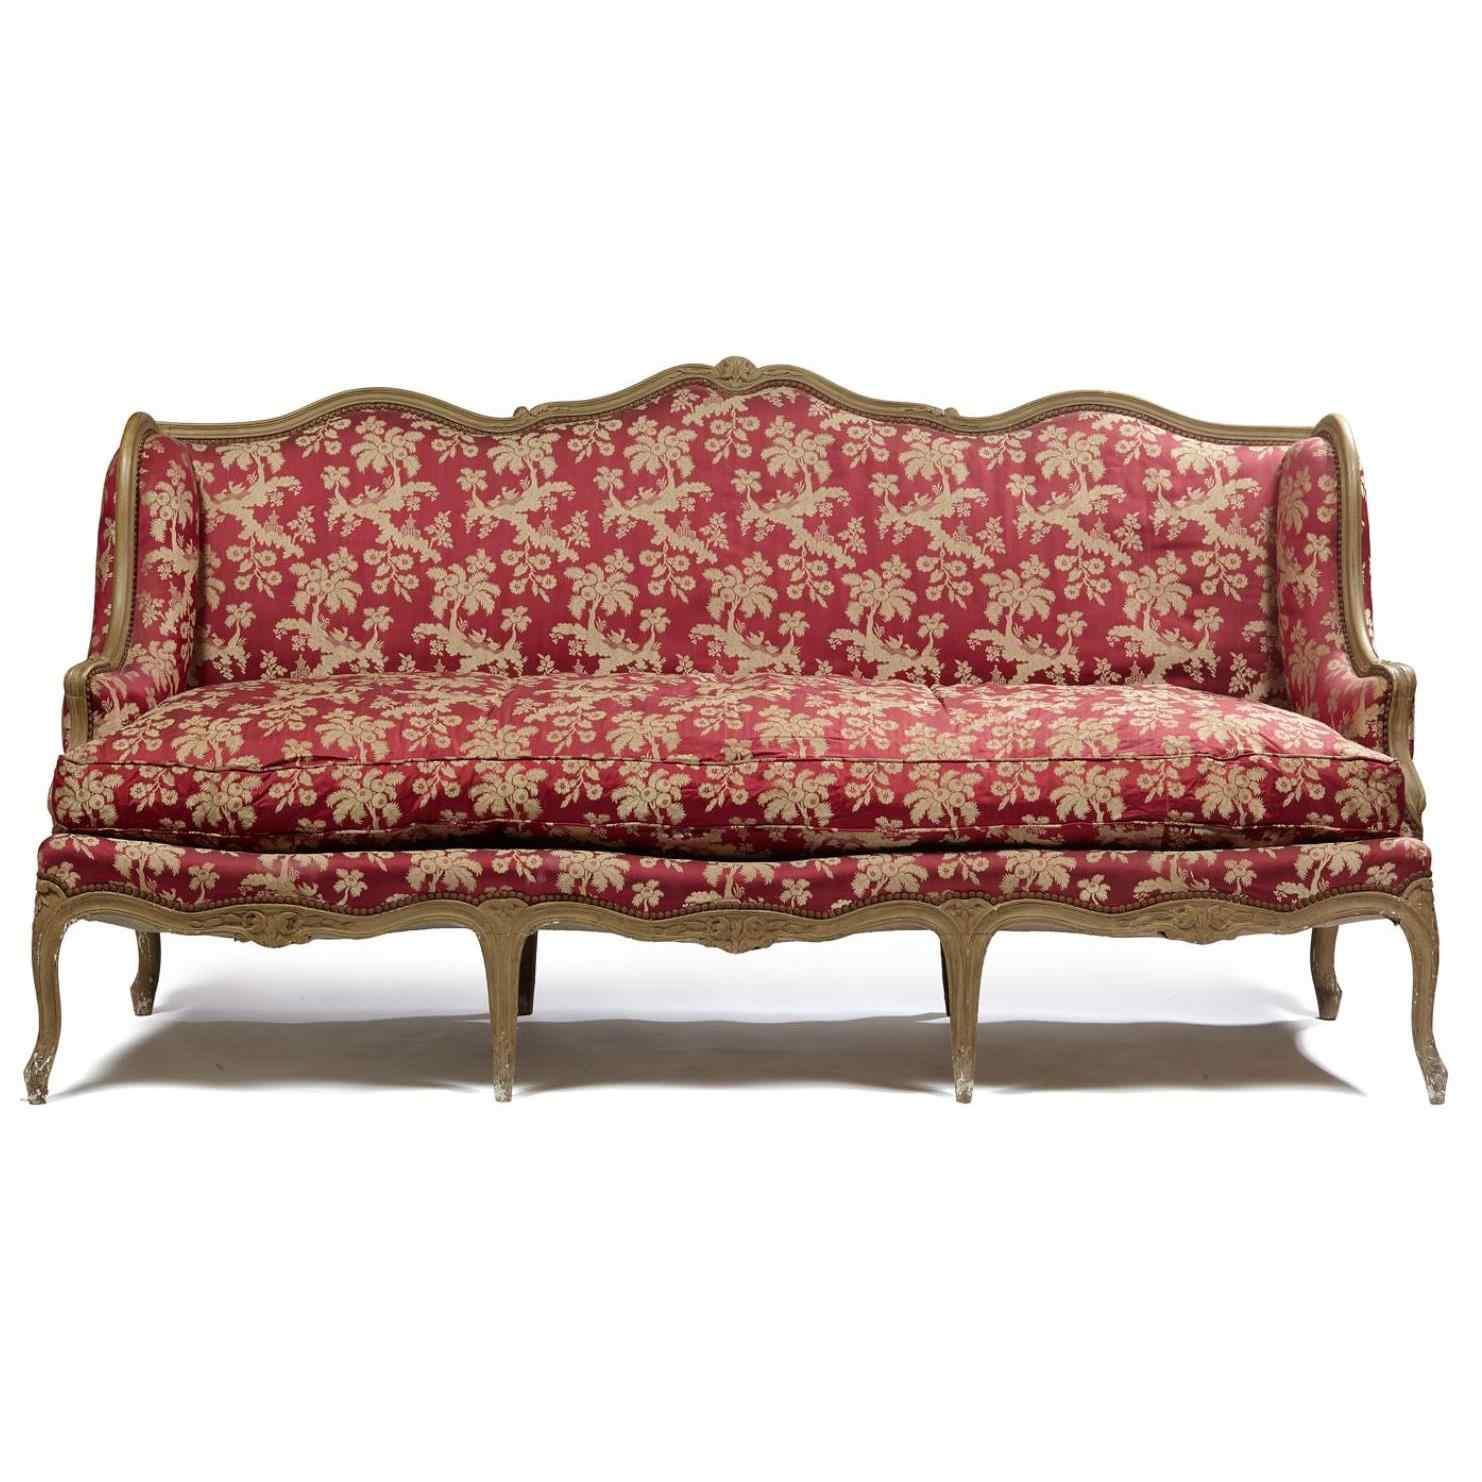 XVIII th/XIX th Century flat-backed sofa